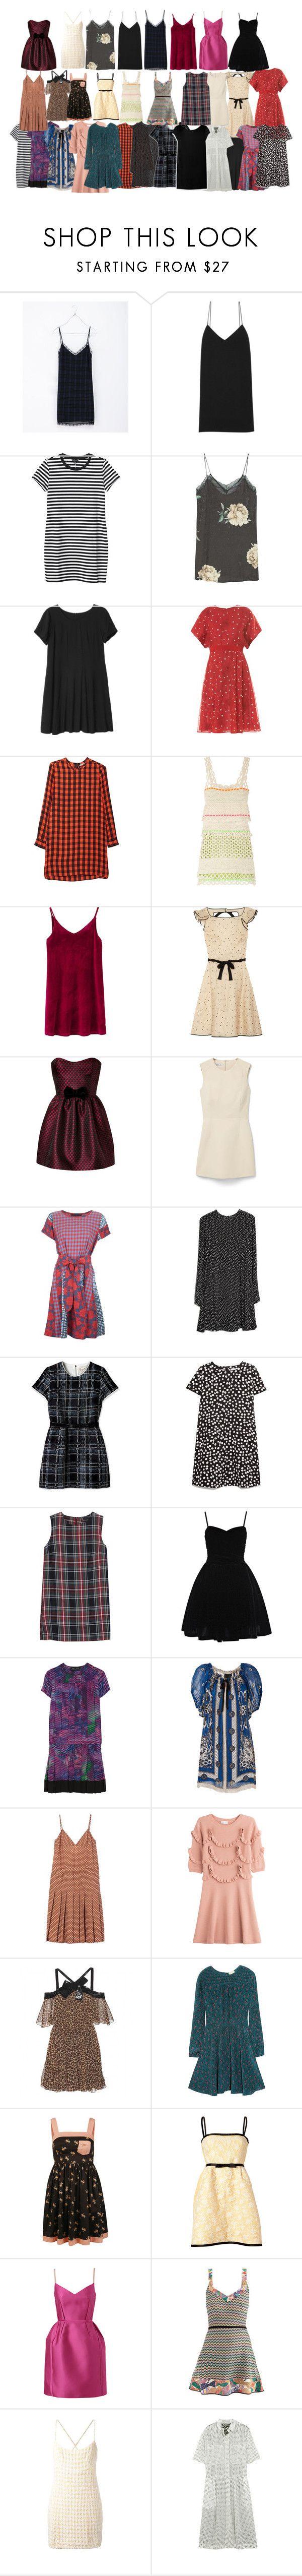 """dress"" by anaunderground on Polyvore featuring moda, Zara, The Row, Monki, MANGO, Giambattista Valli, Equipment, Moschino Cheap & Chic, WithChic e Valentino"